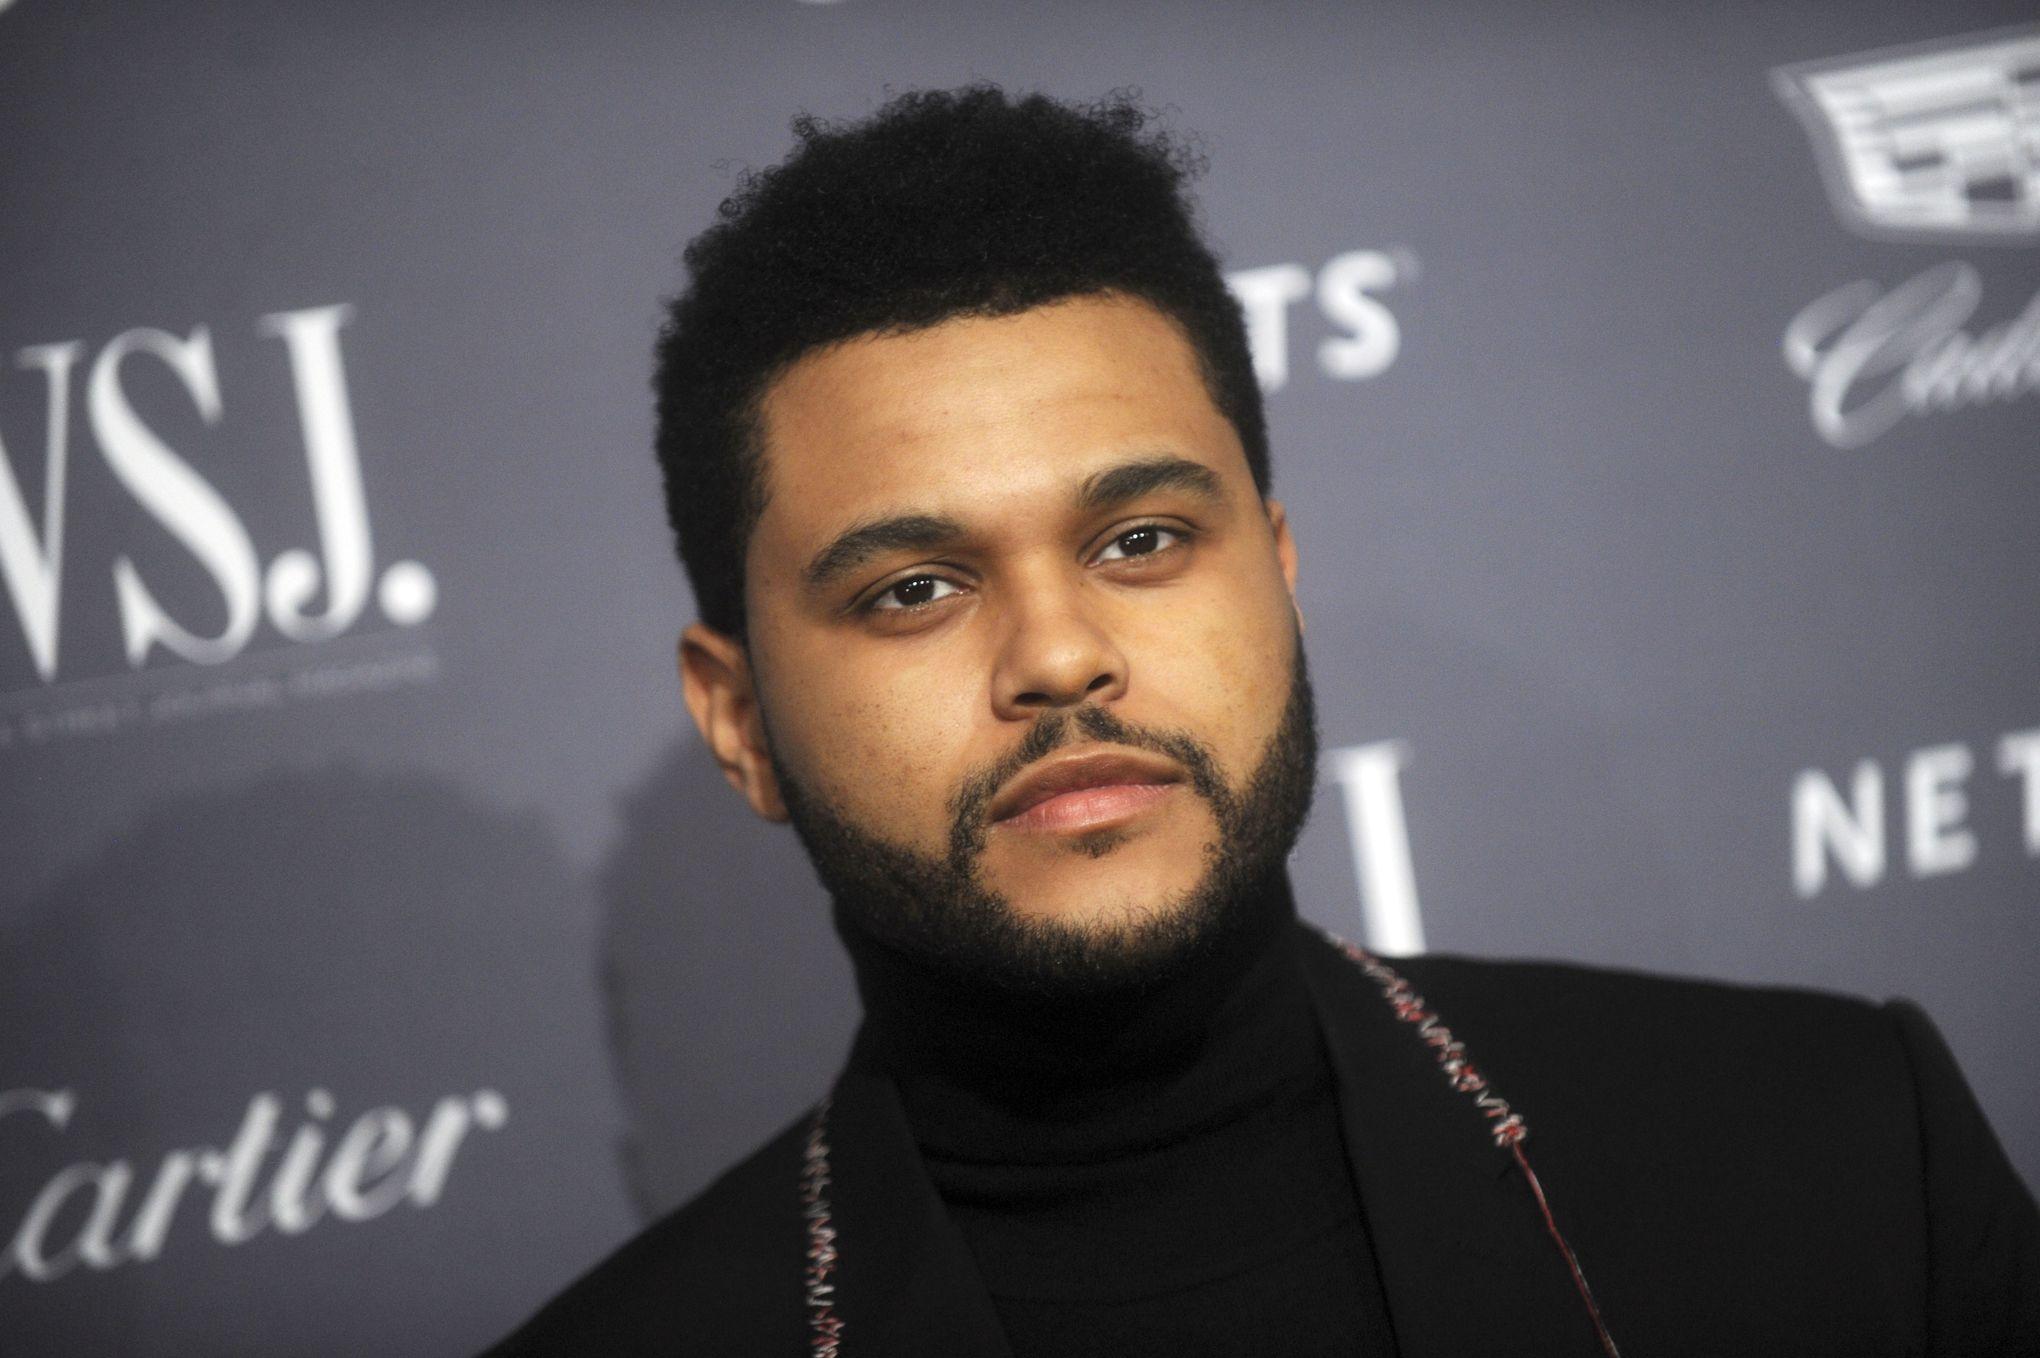 c60063d5cf1ce Après la vente de pulls jugés racistes, The Weeknd rompt son contrat ...